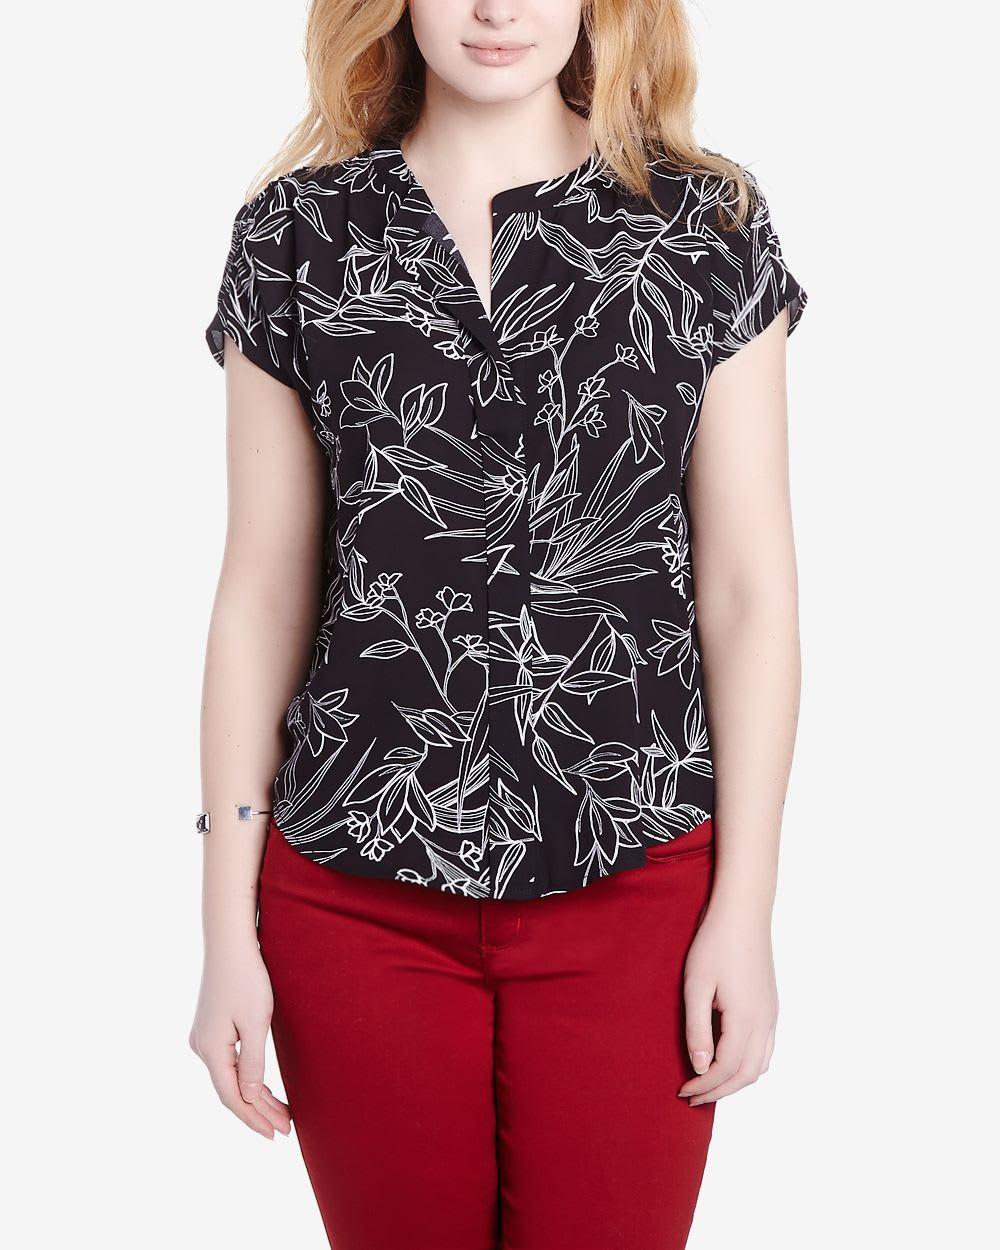 Zenobia Short Sleeve Printed Blouse 25